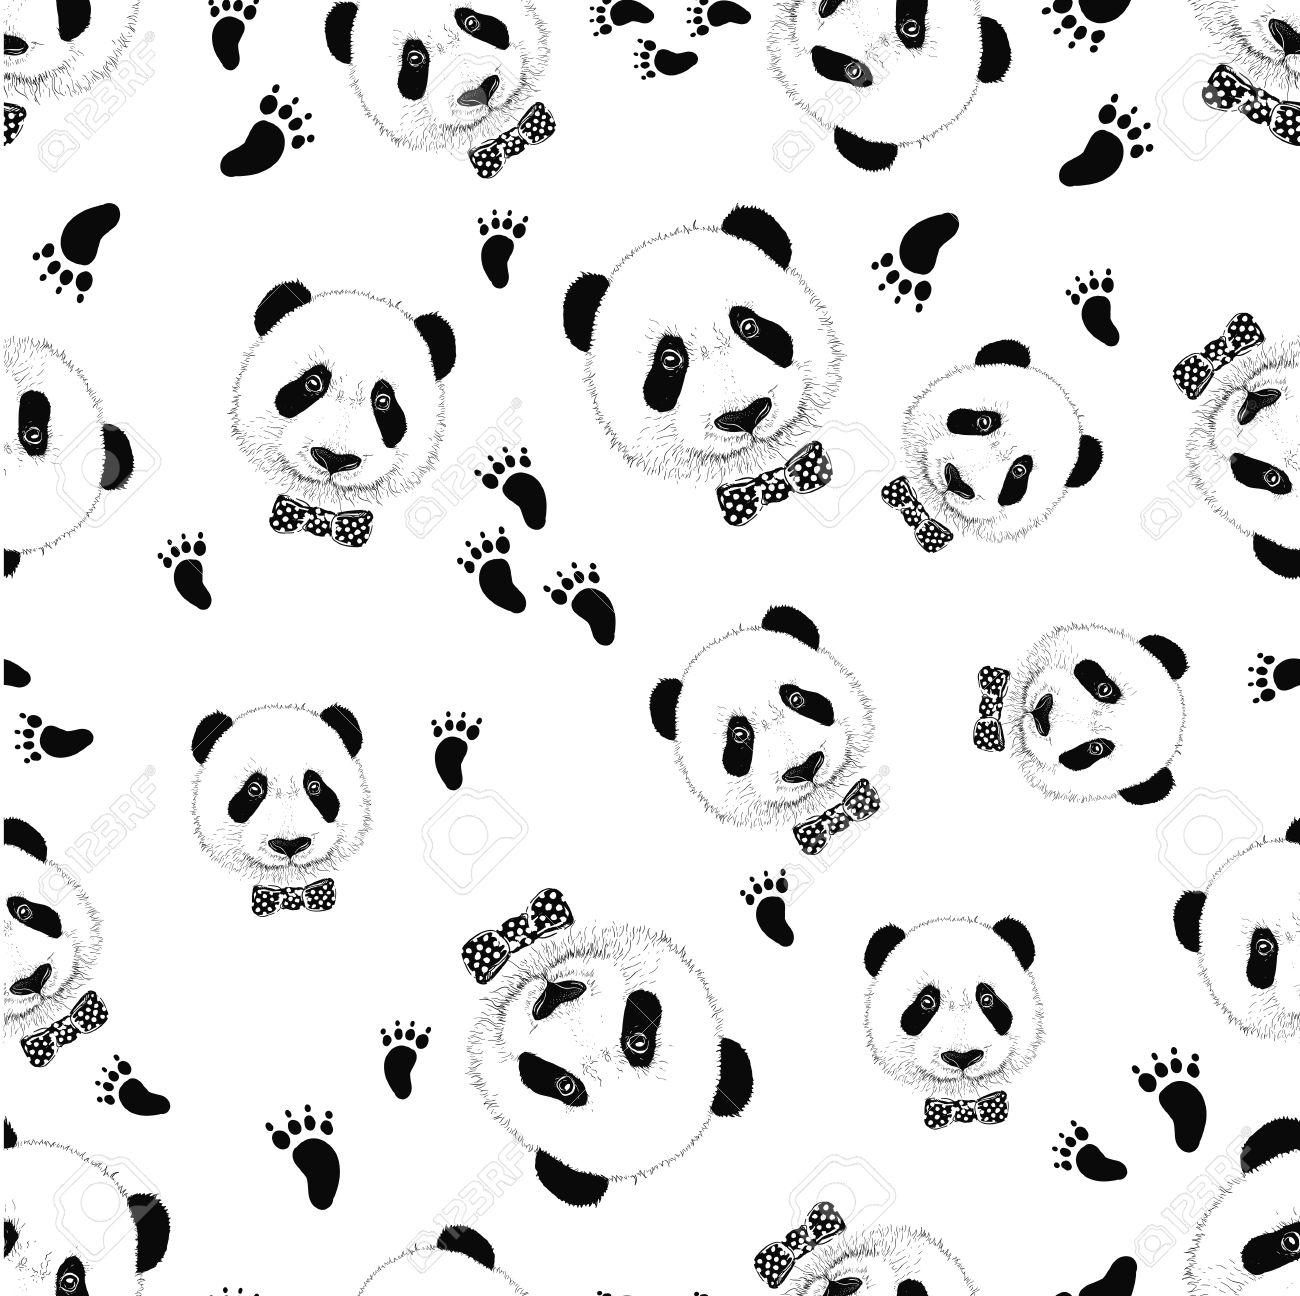 Panda Face by elieang on DeviantArt